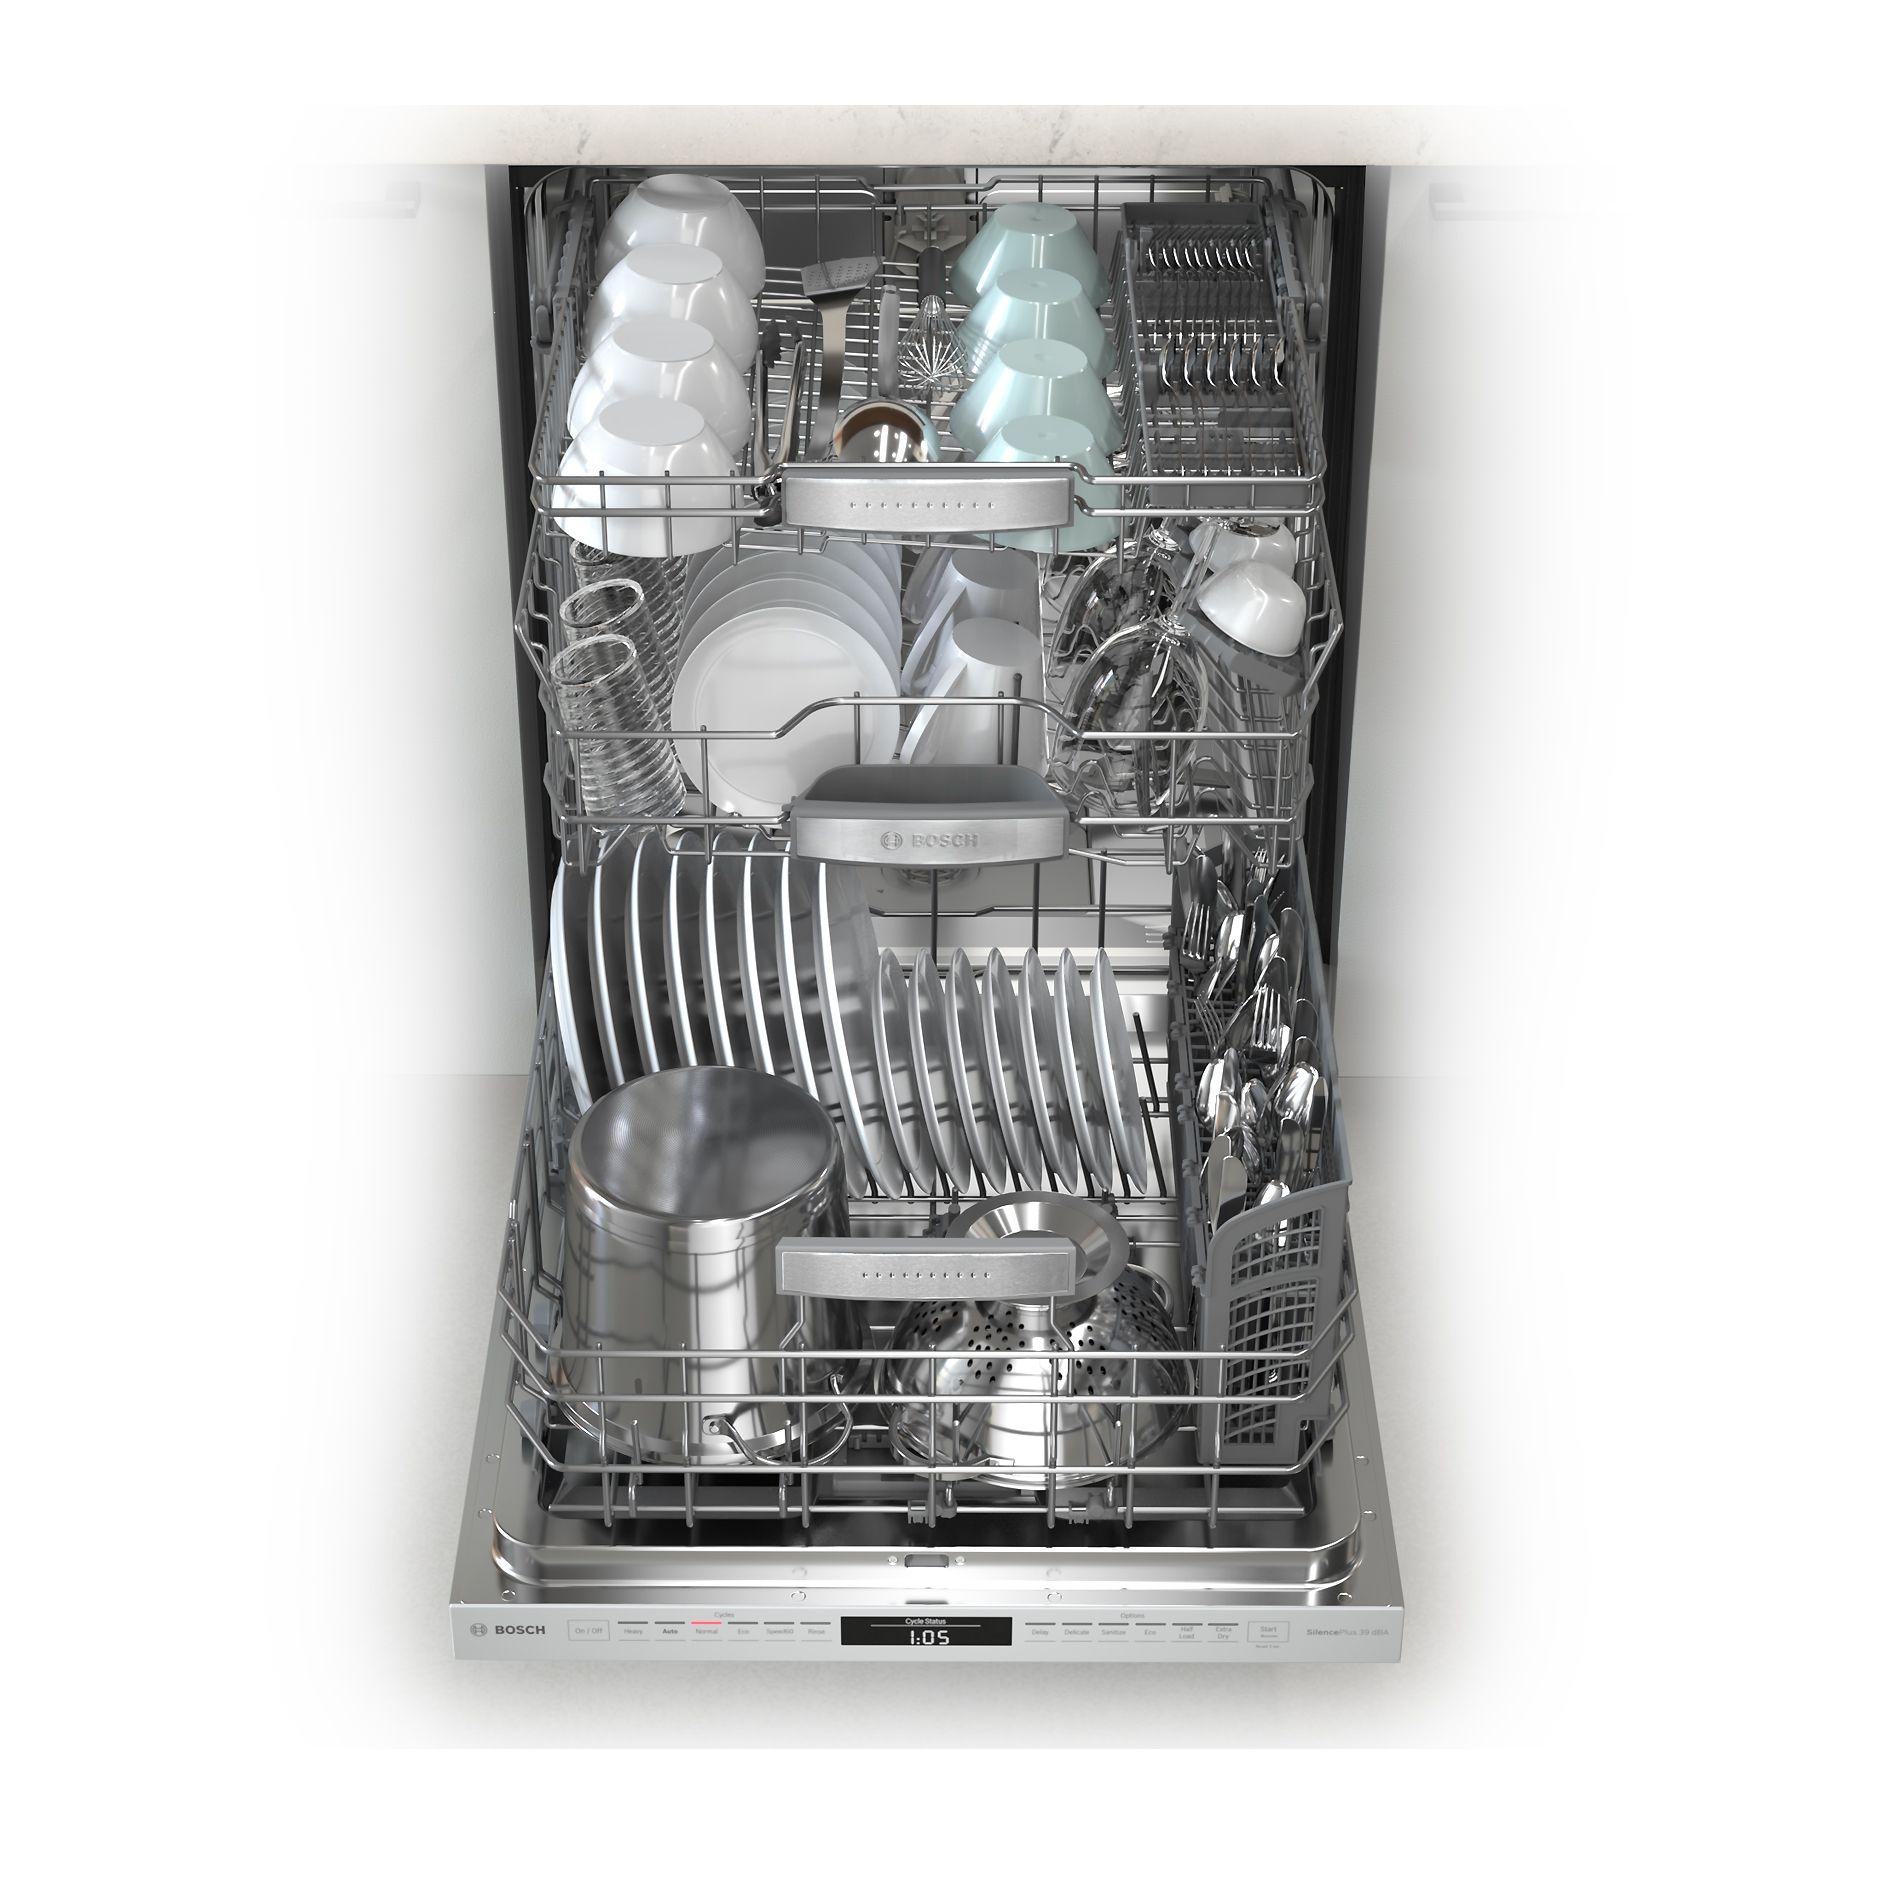 What Makes Bosch Premium Dishwashers Premium Cool Things To Buy